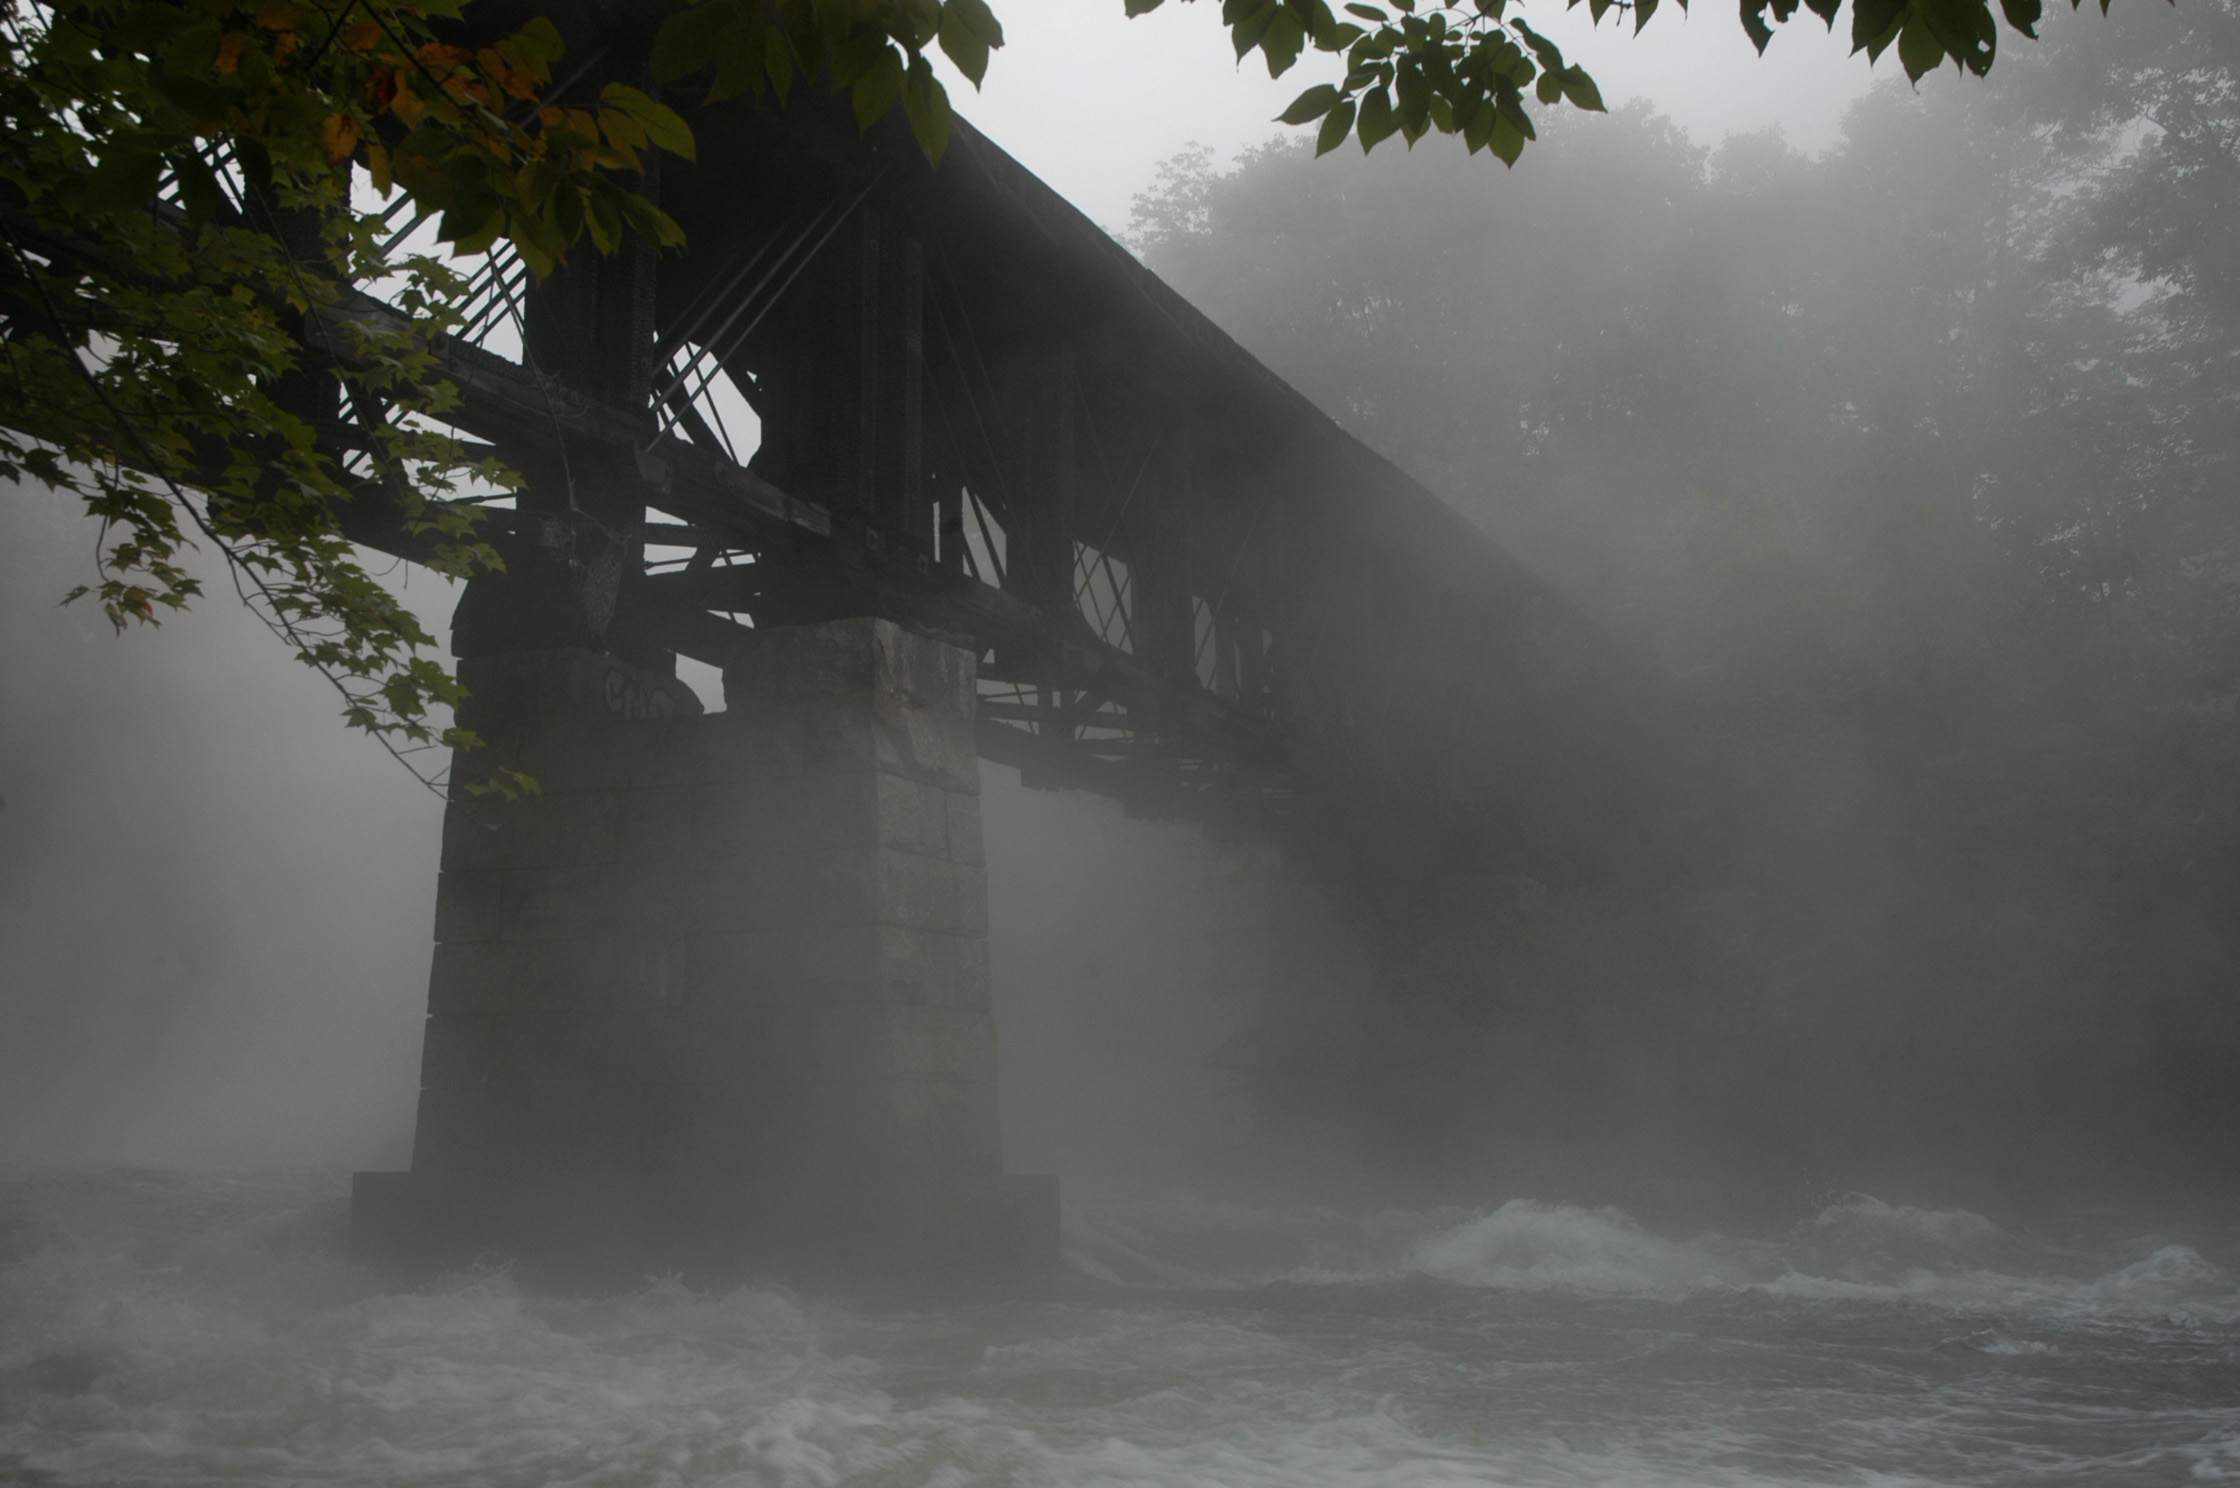 Sulphite Bridge - Unusual NH Covered Bridge